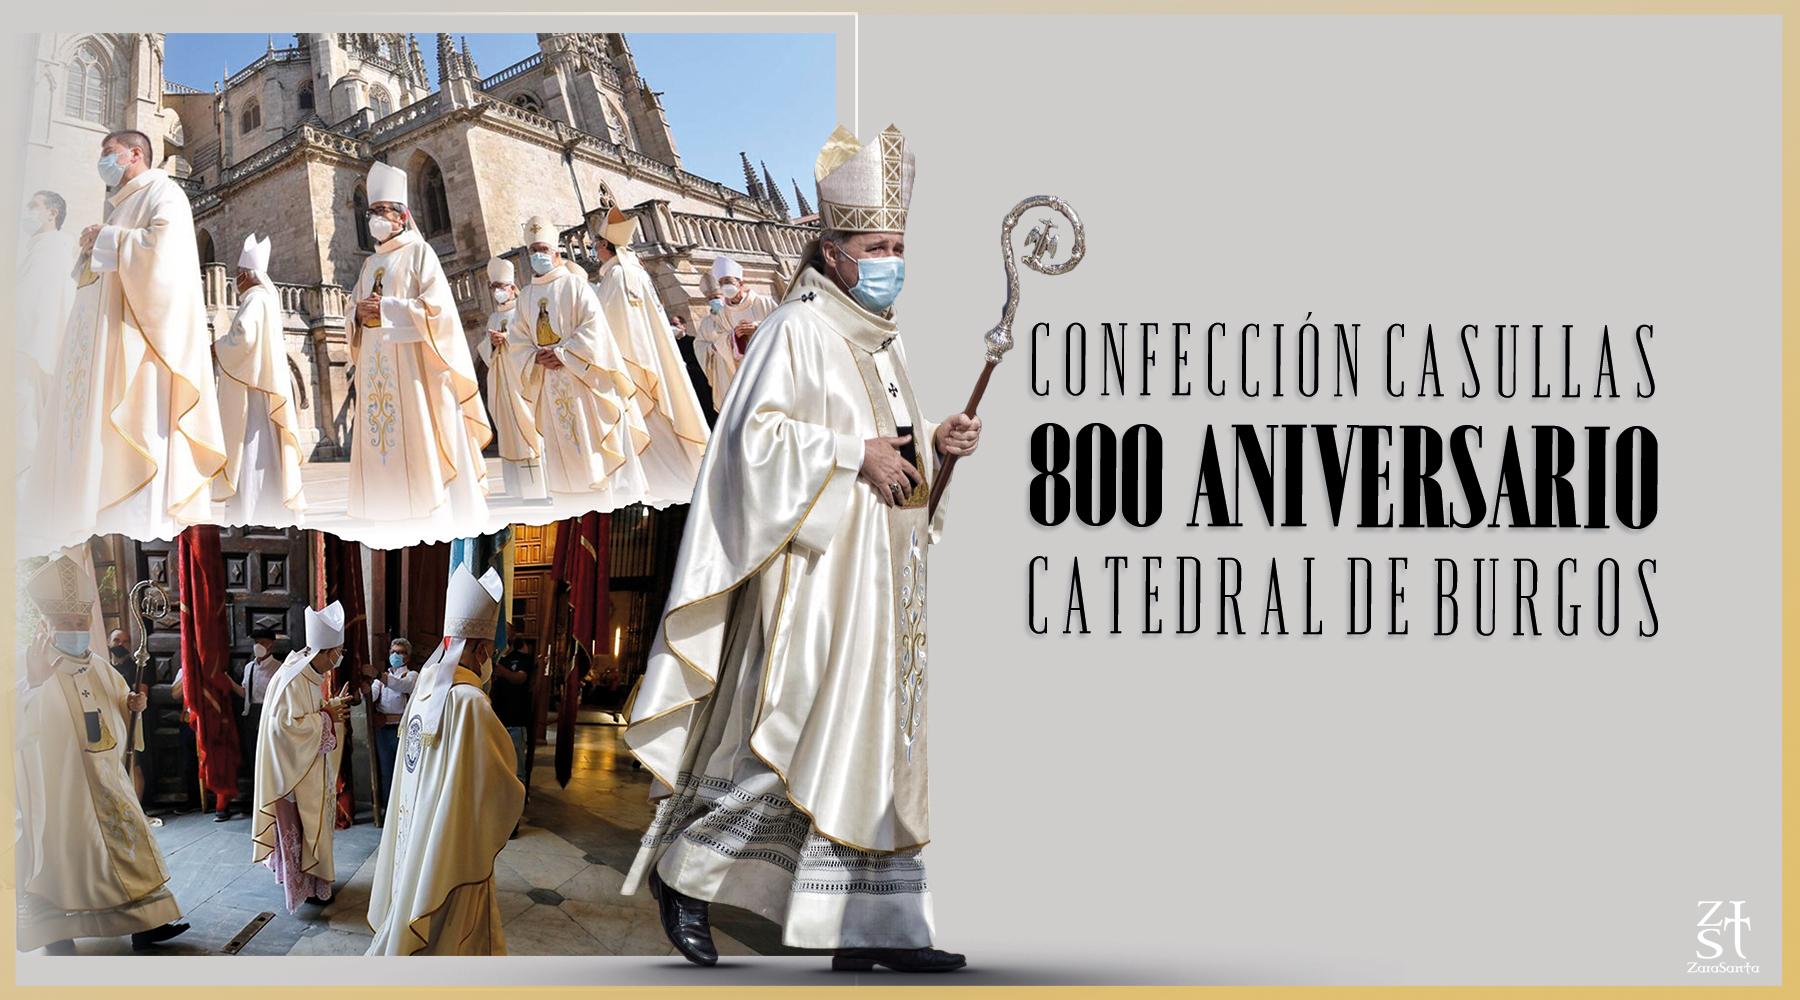 Aniversario catedral de Burgos